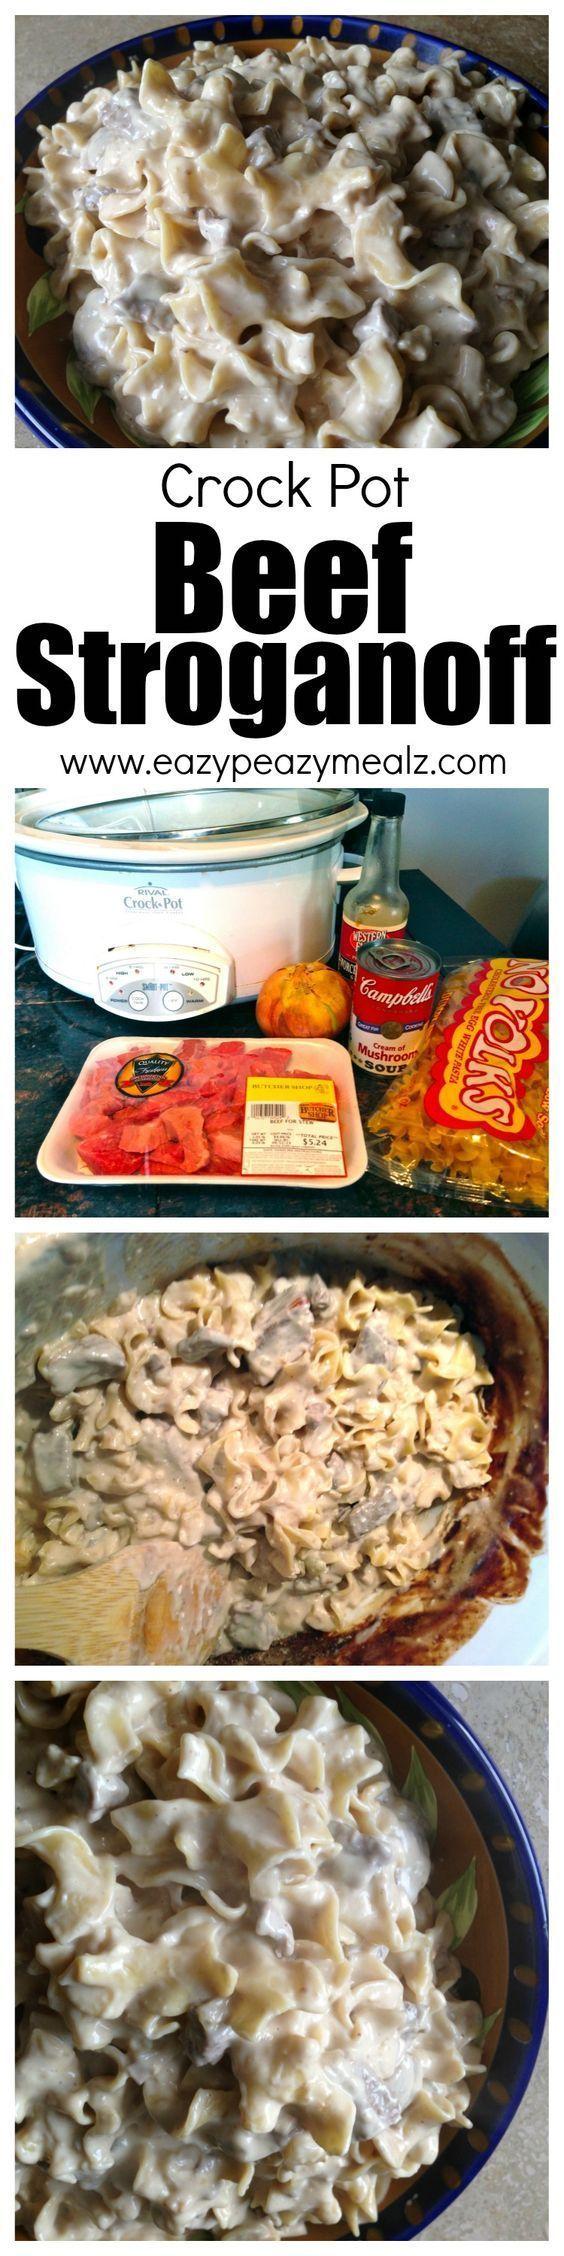 Fast Cooking Crock Pot Part - 40: Crock Pot Beef Stroganoff